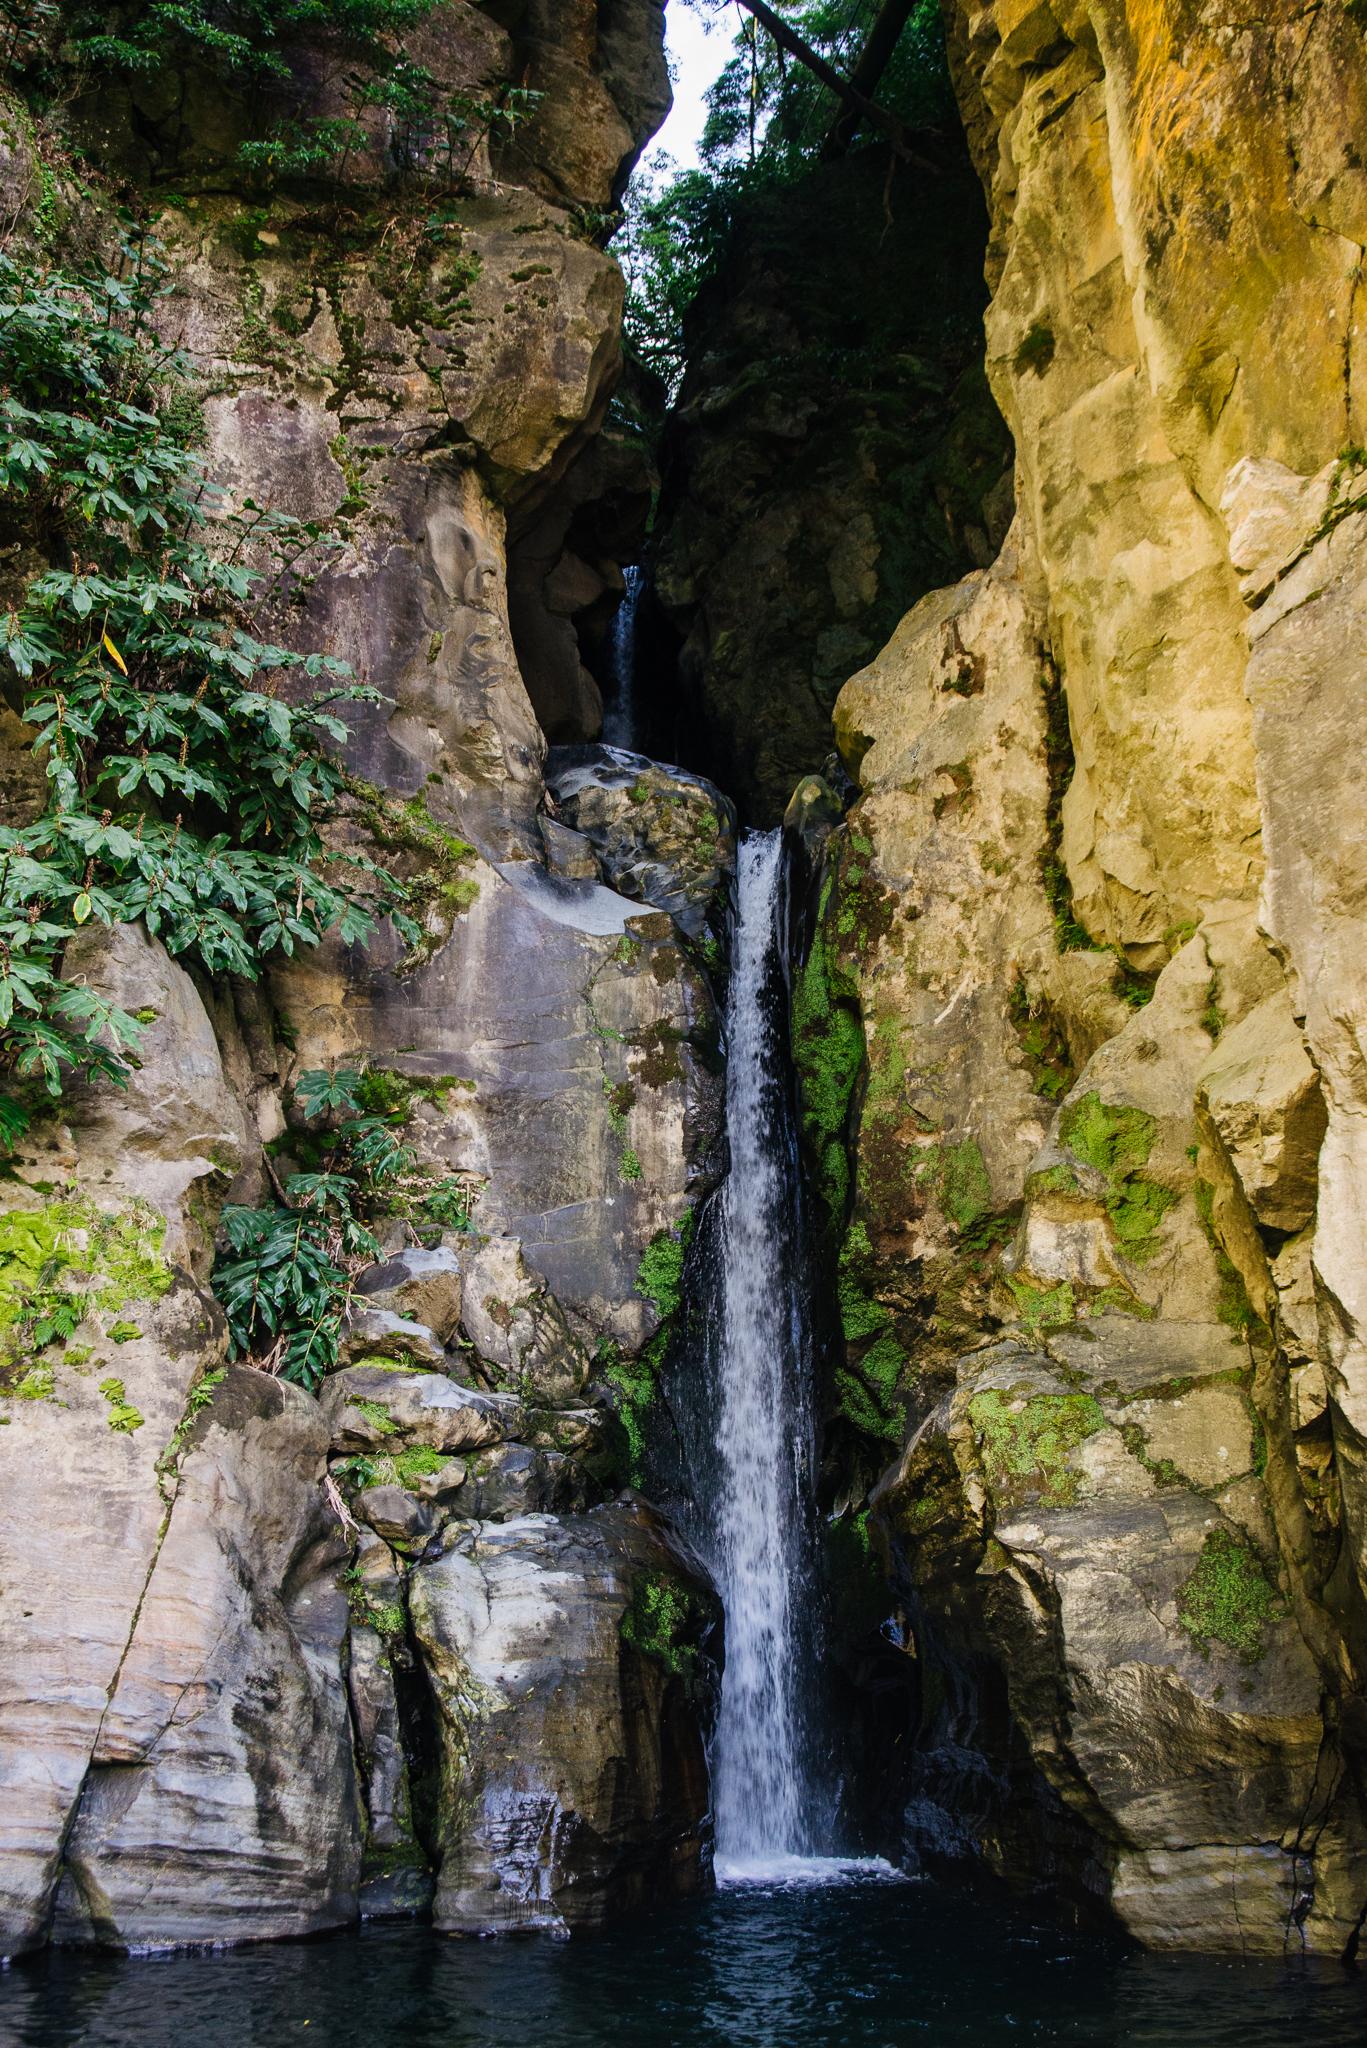 Salto do Cabrito waterfall